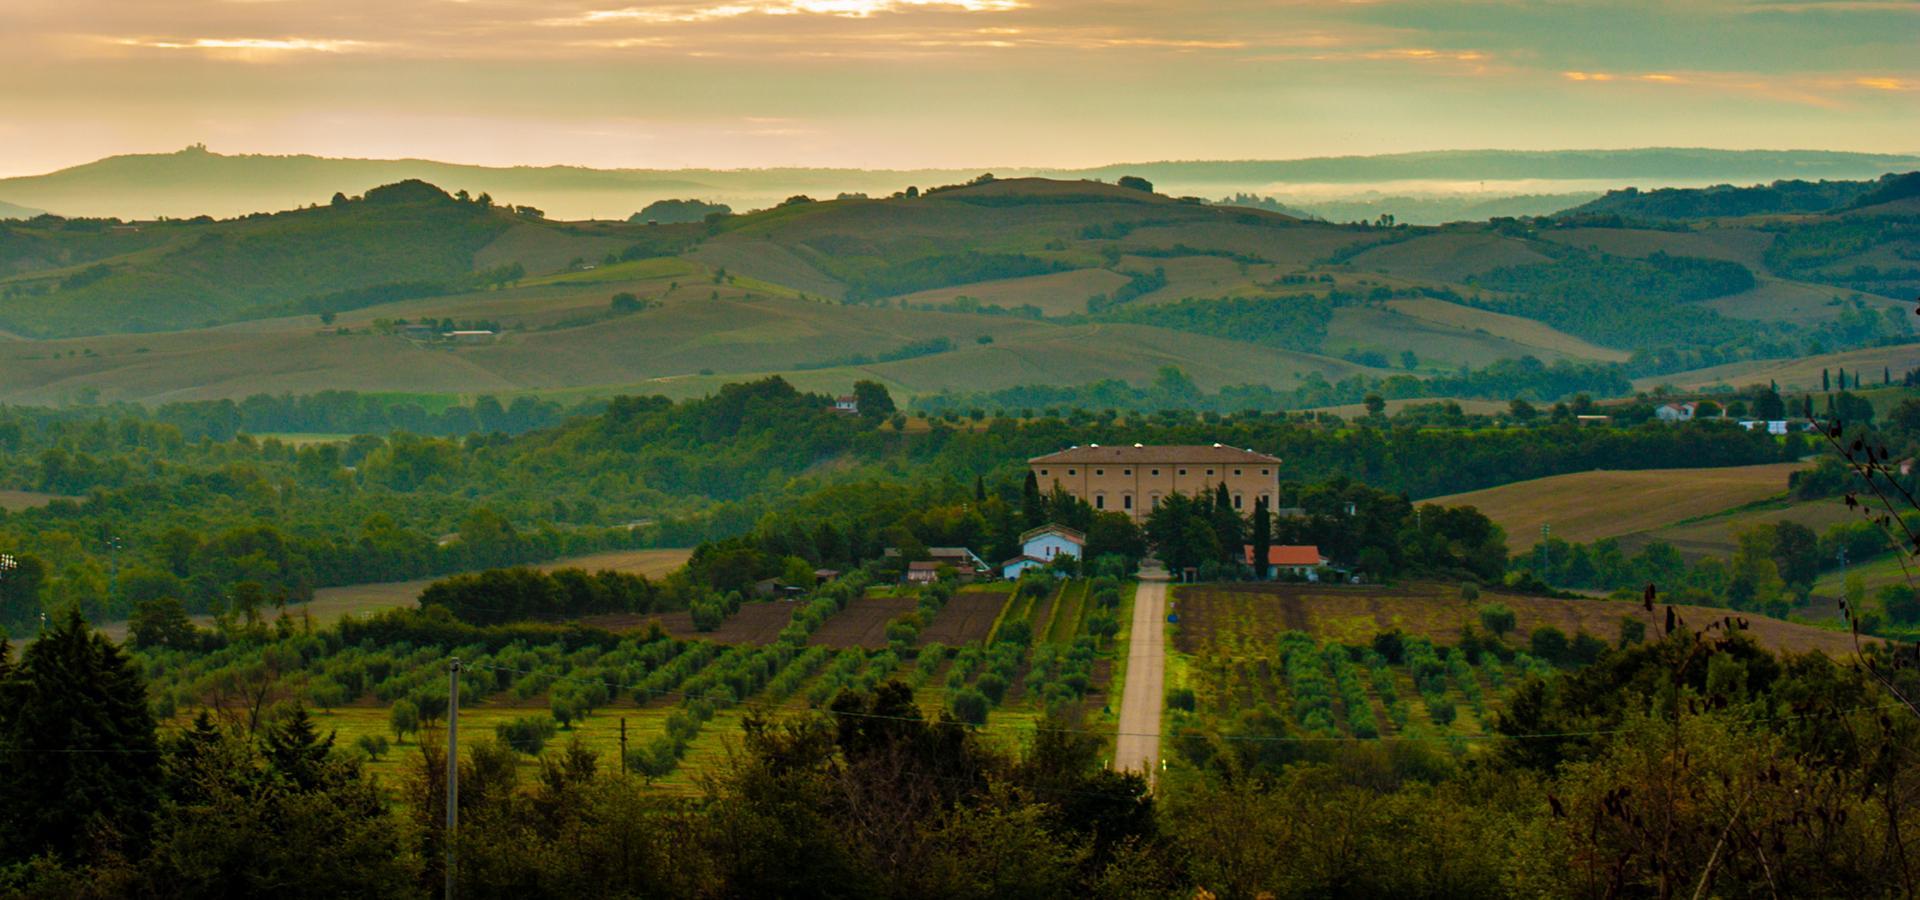 visit-castellazzara-la-toscana-da-scoprire-esperienze